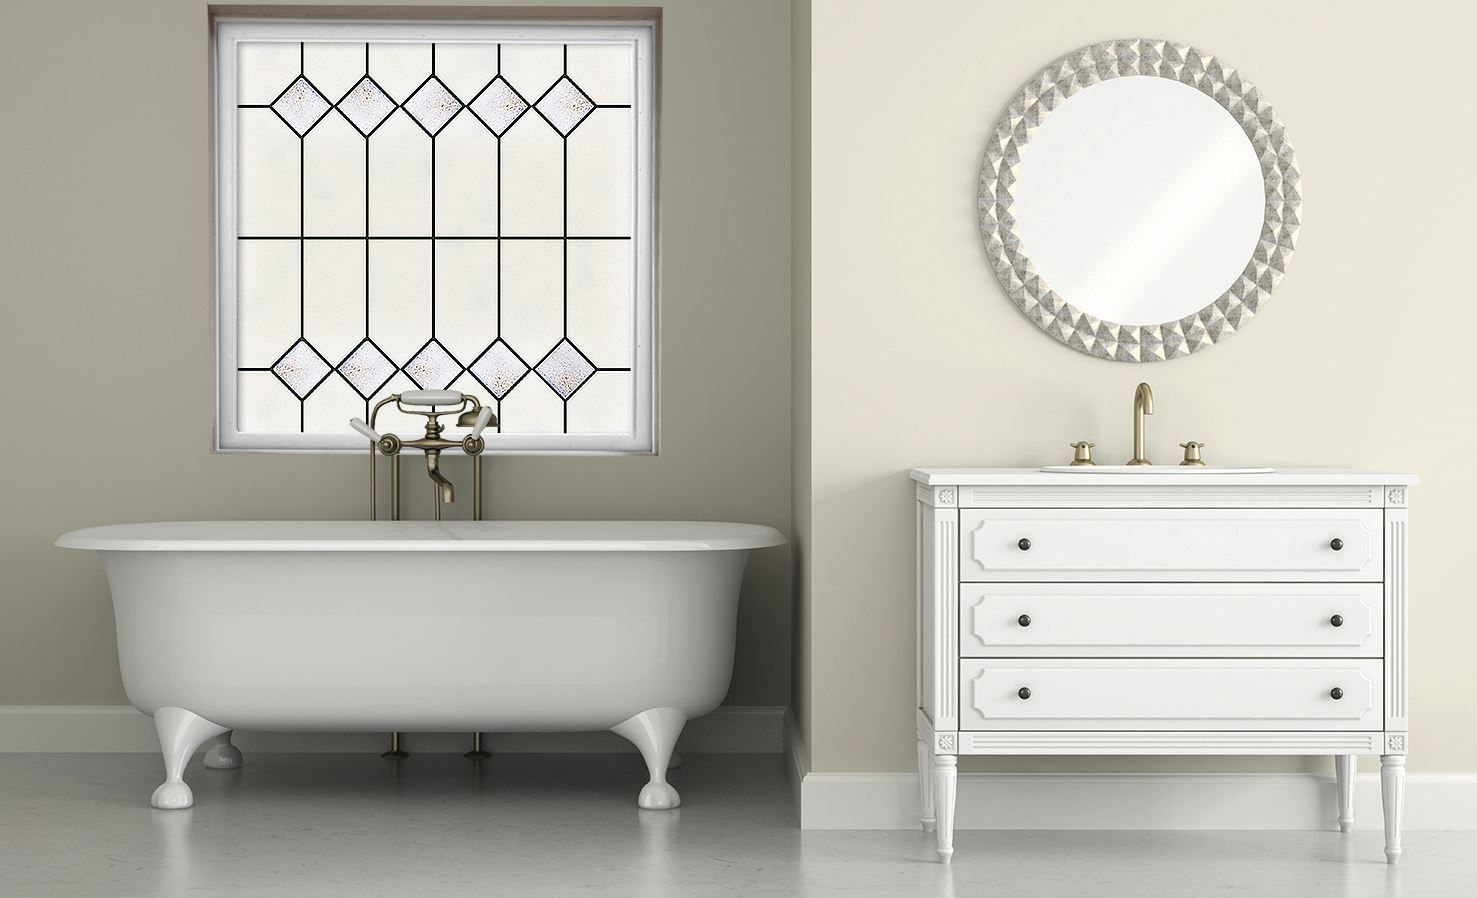 Hy-Lite Home Designer Collection Designer-Inspired Decorative Glass ...